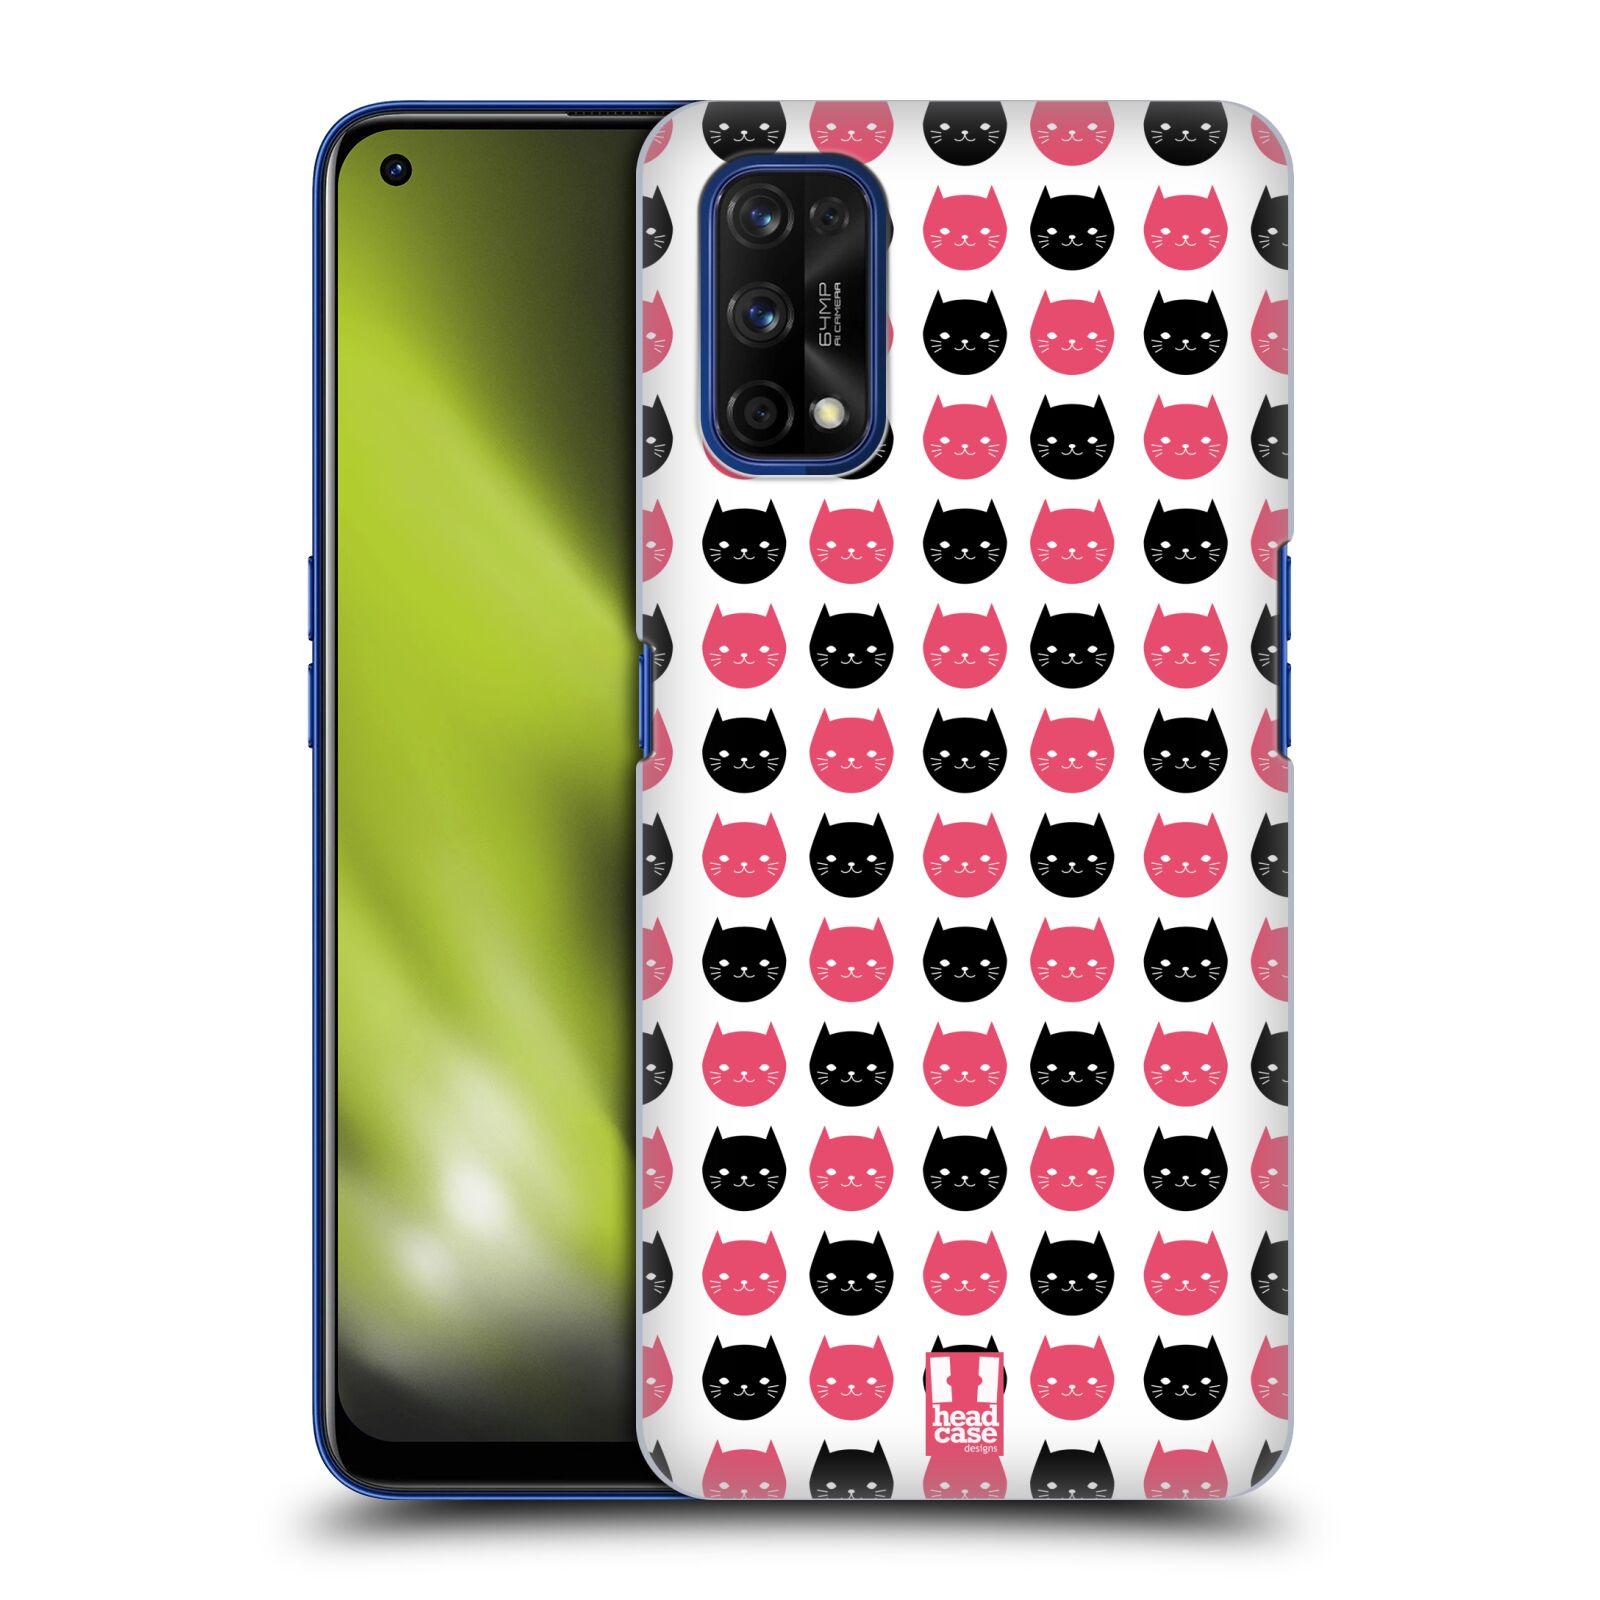 Plastové pouzdro na mobil Realme 7 Pro - Head Case - KOČKY Black and Pink